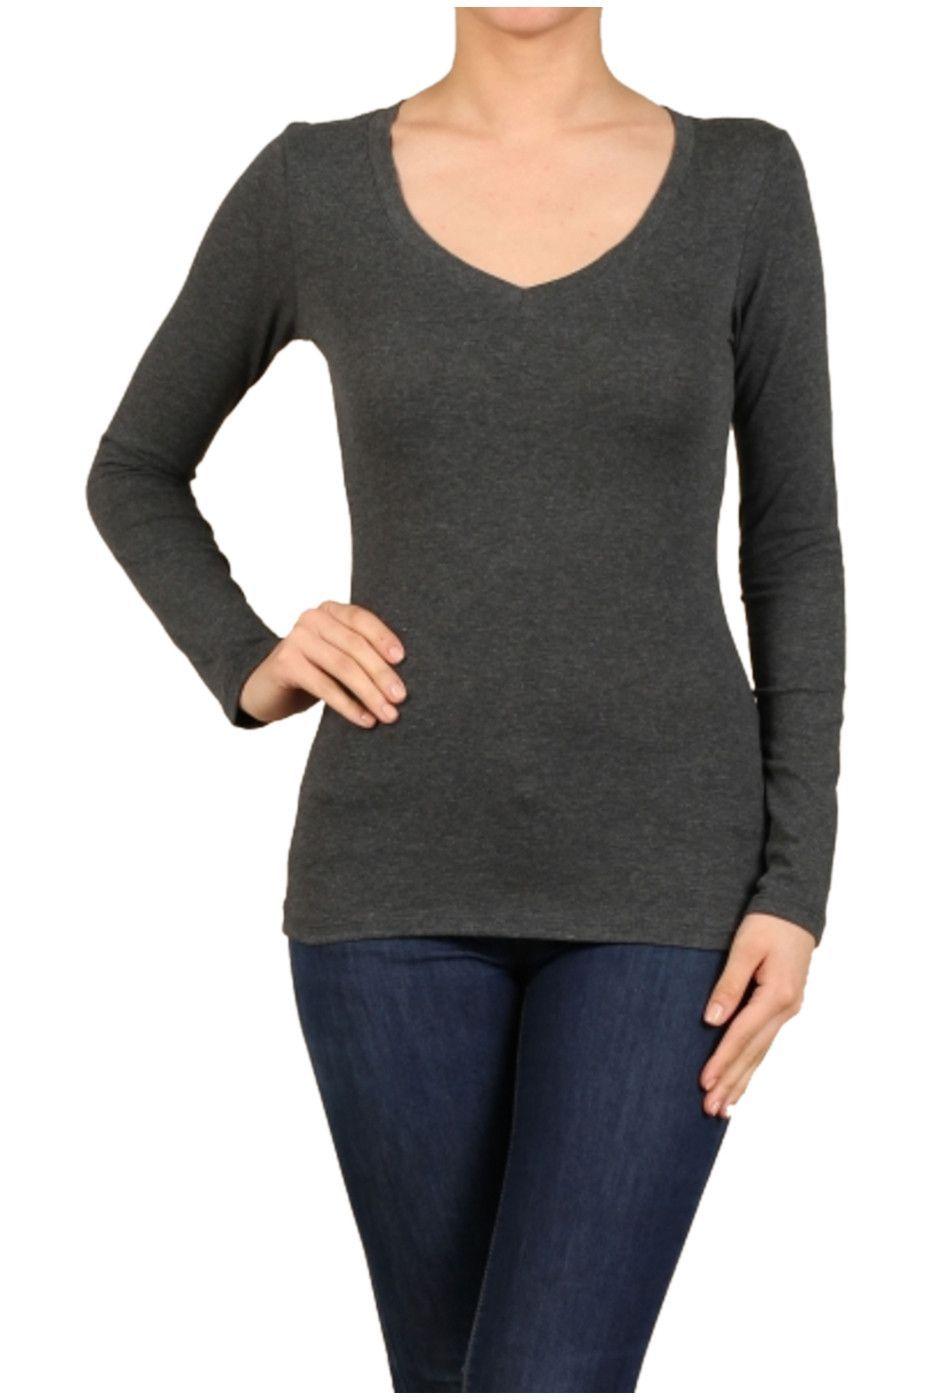 Basic Long Sleeve Scoop or V-Neck Top